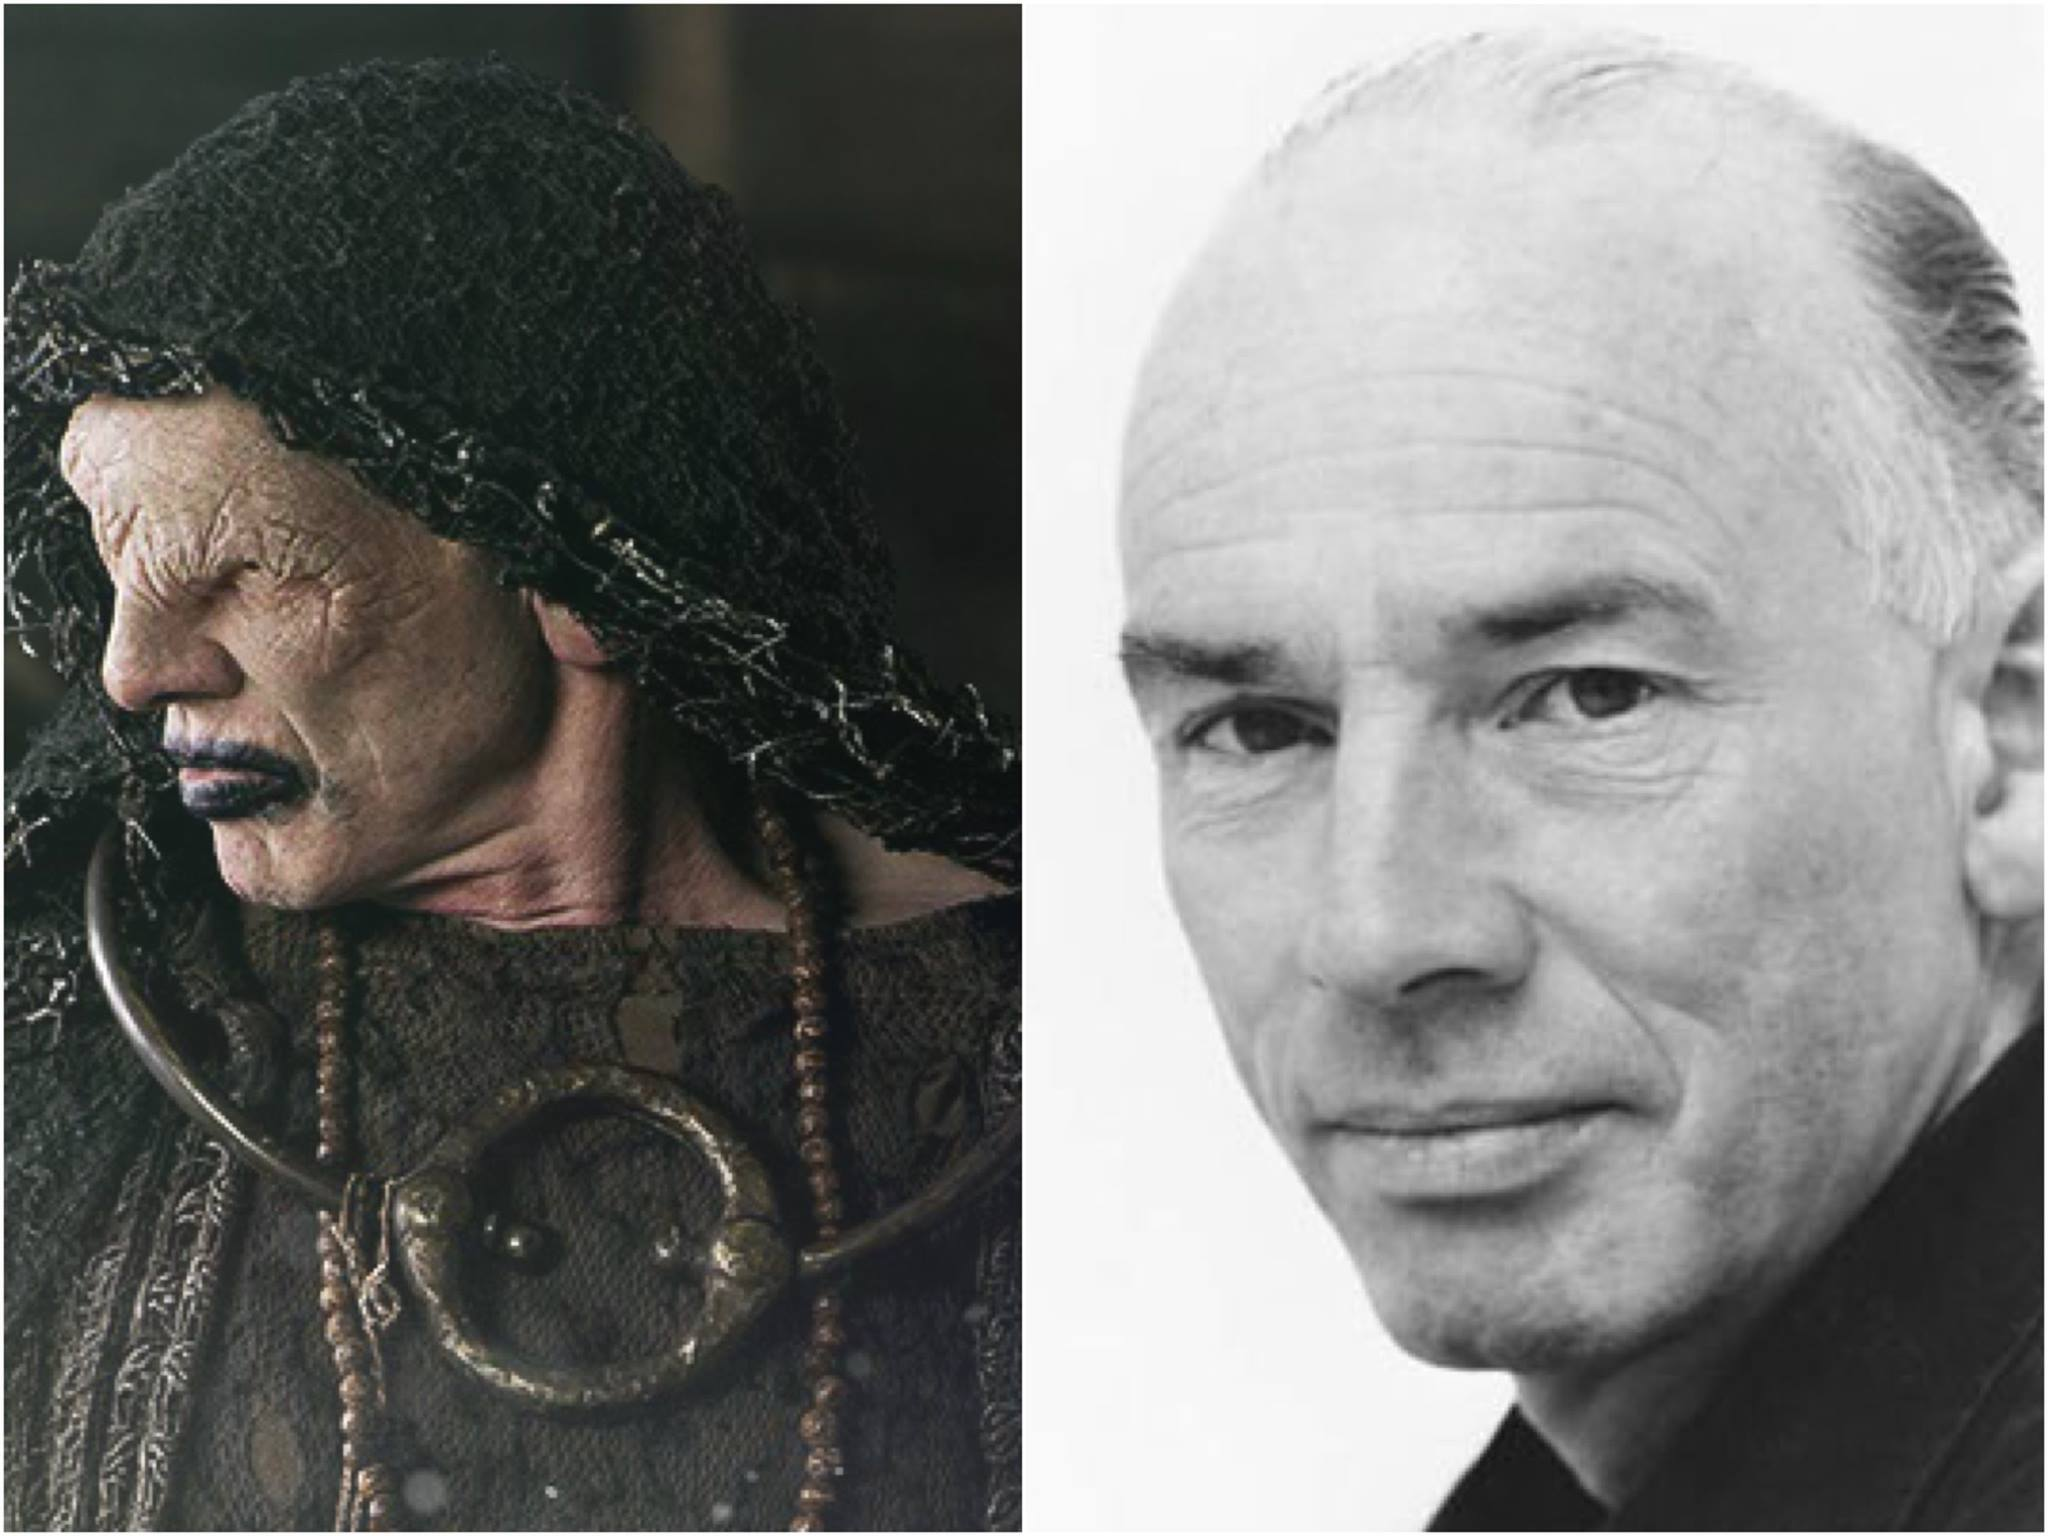 Viking Saga The strangest person in Kattegat  Time Slips